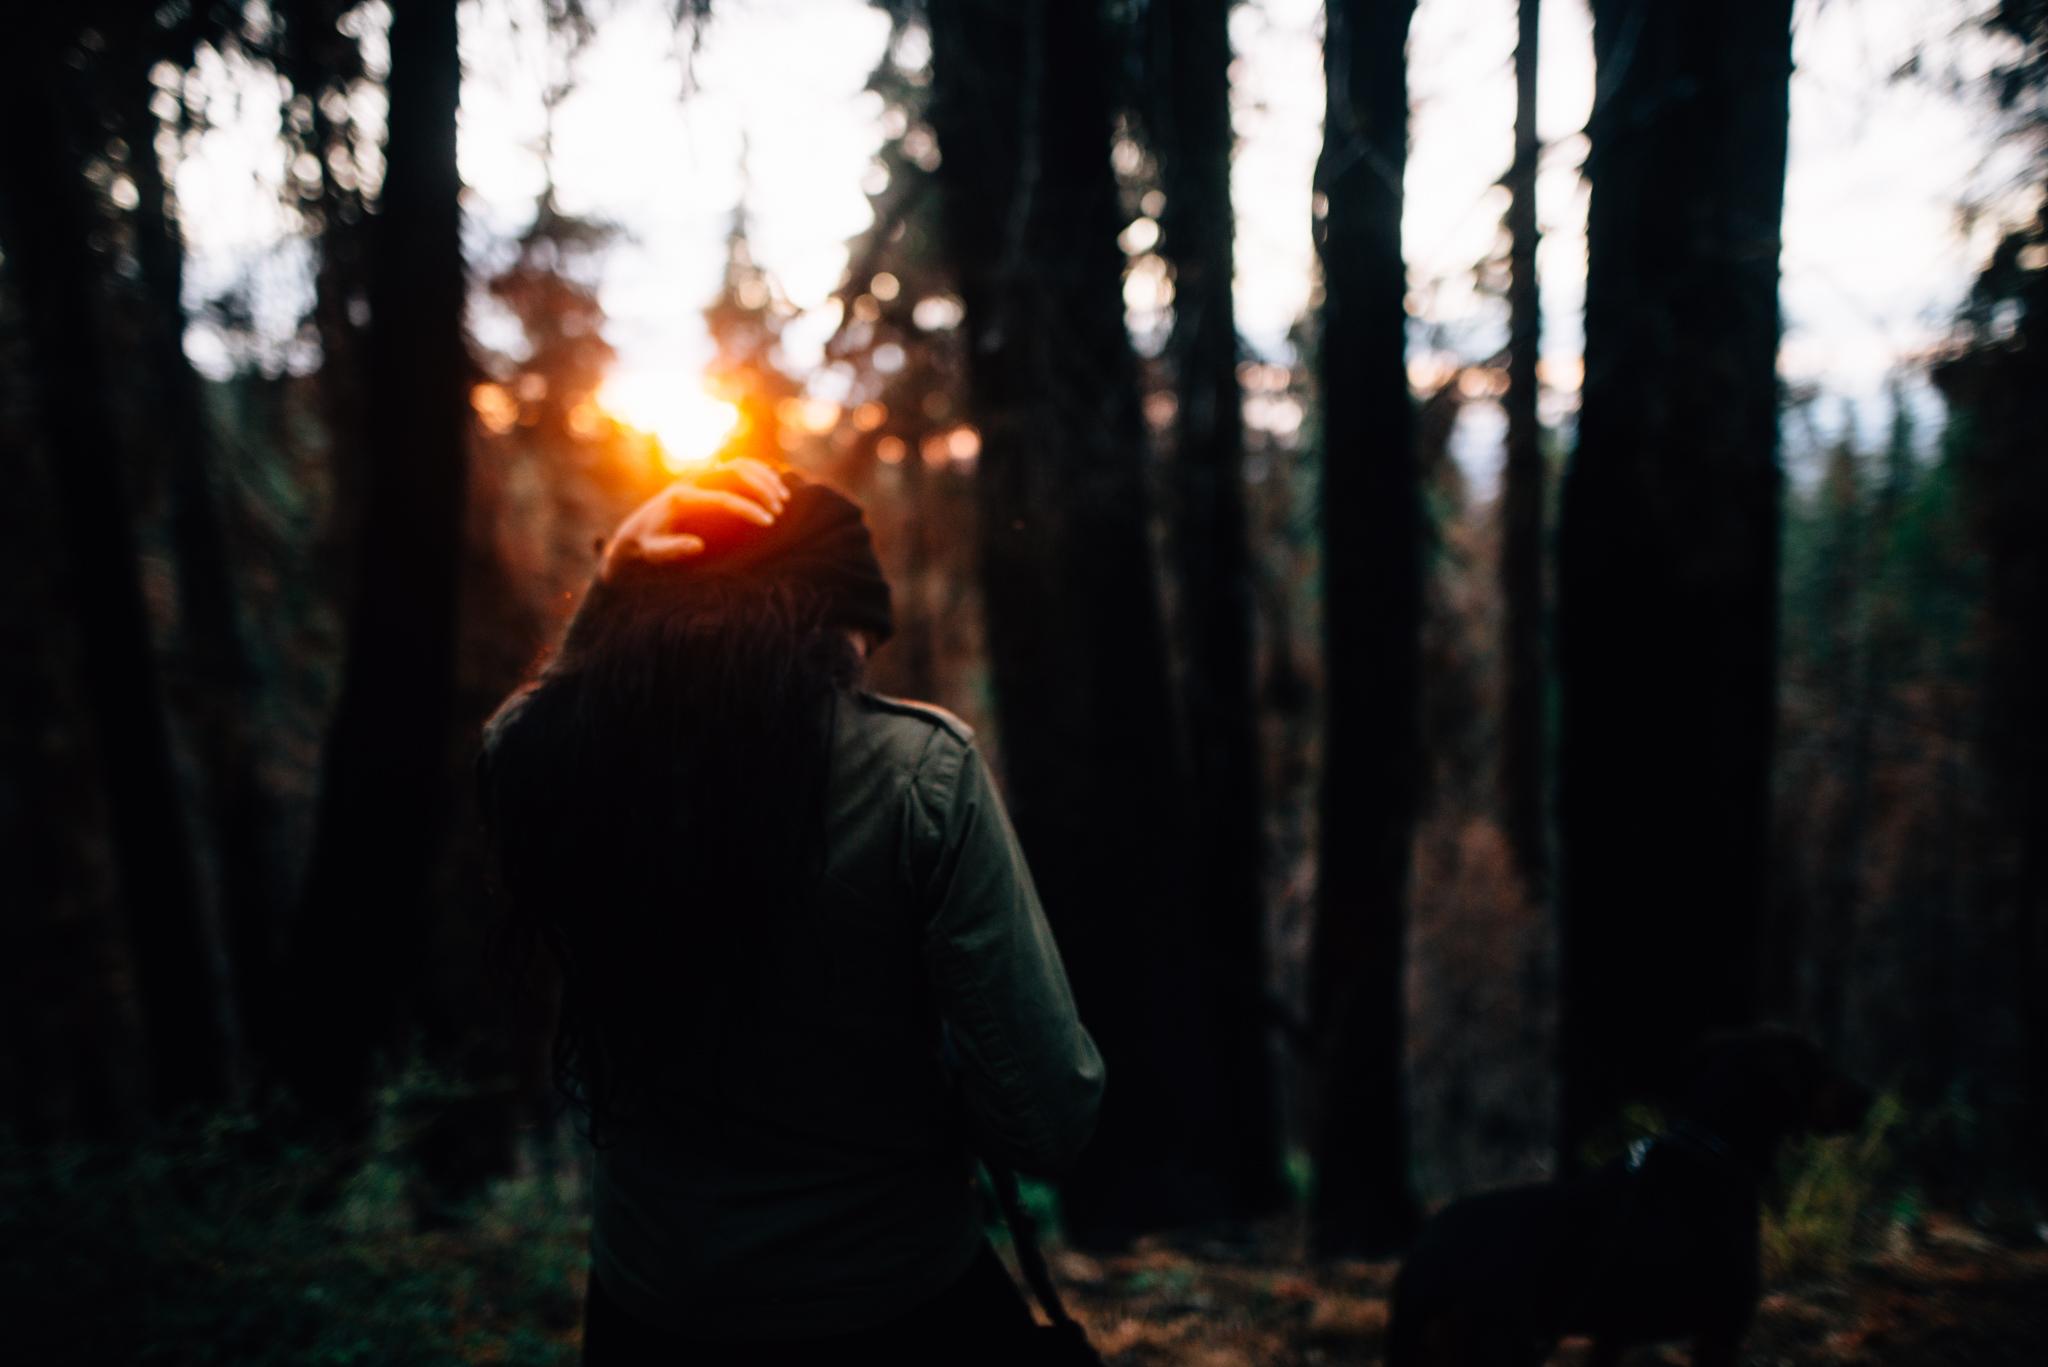 ©The Ryans Photography - Los Angeles Travel - Tuolomne Meadows Yosemite-042.jpg